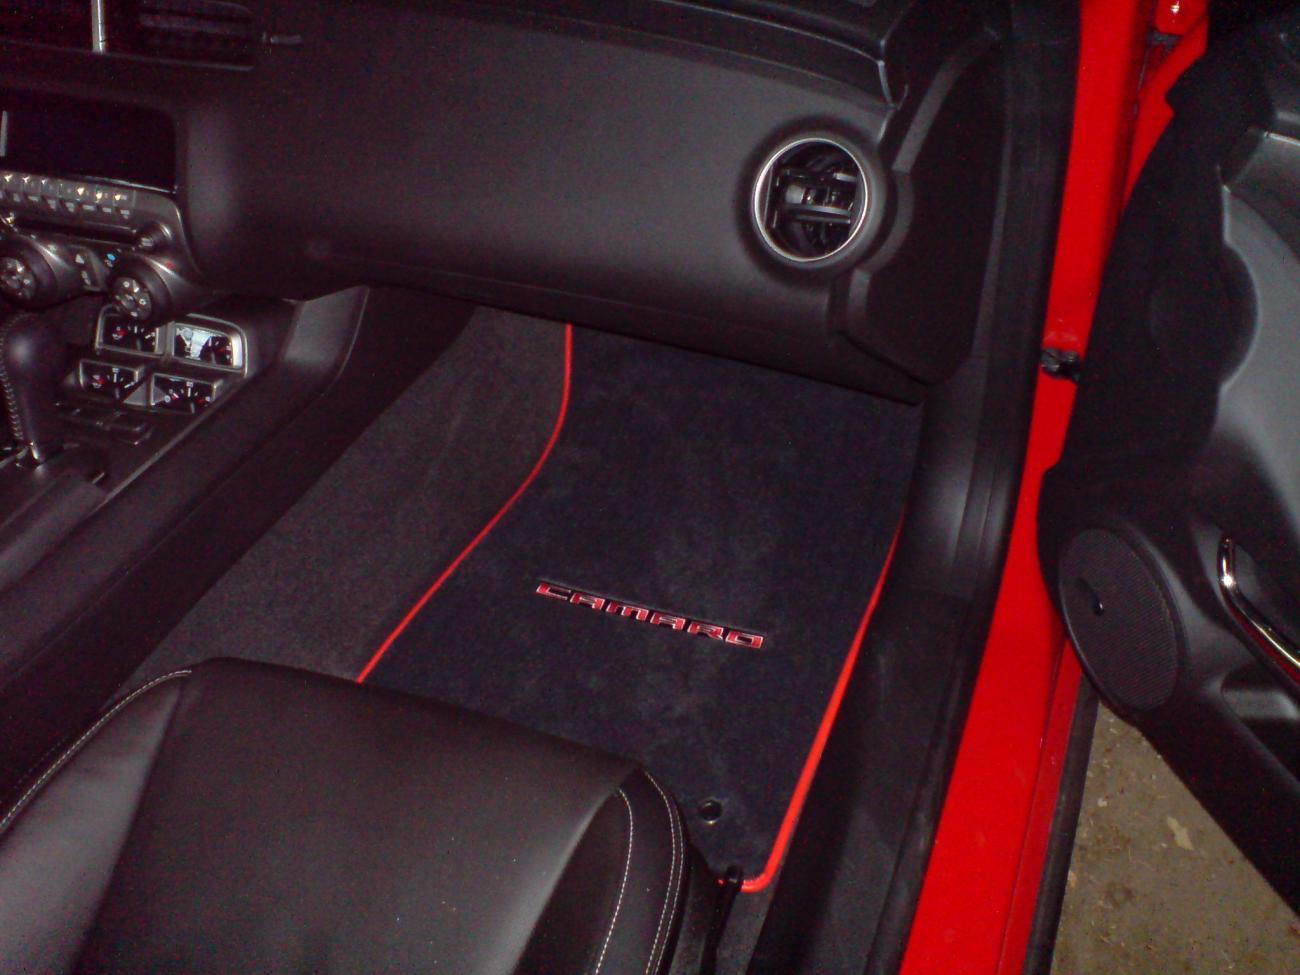 New Camaro Floor Mats (PICS) - Camaro5 Chevy Camaro Forum ...